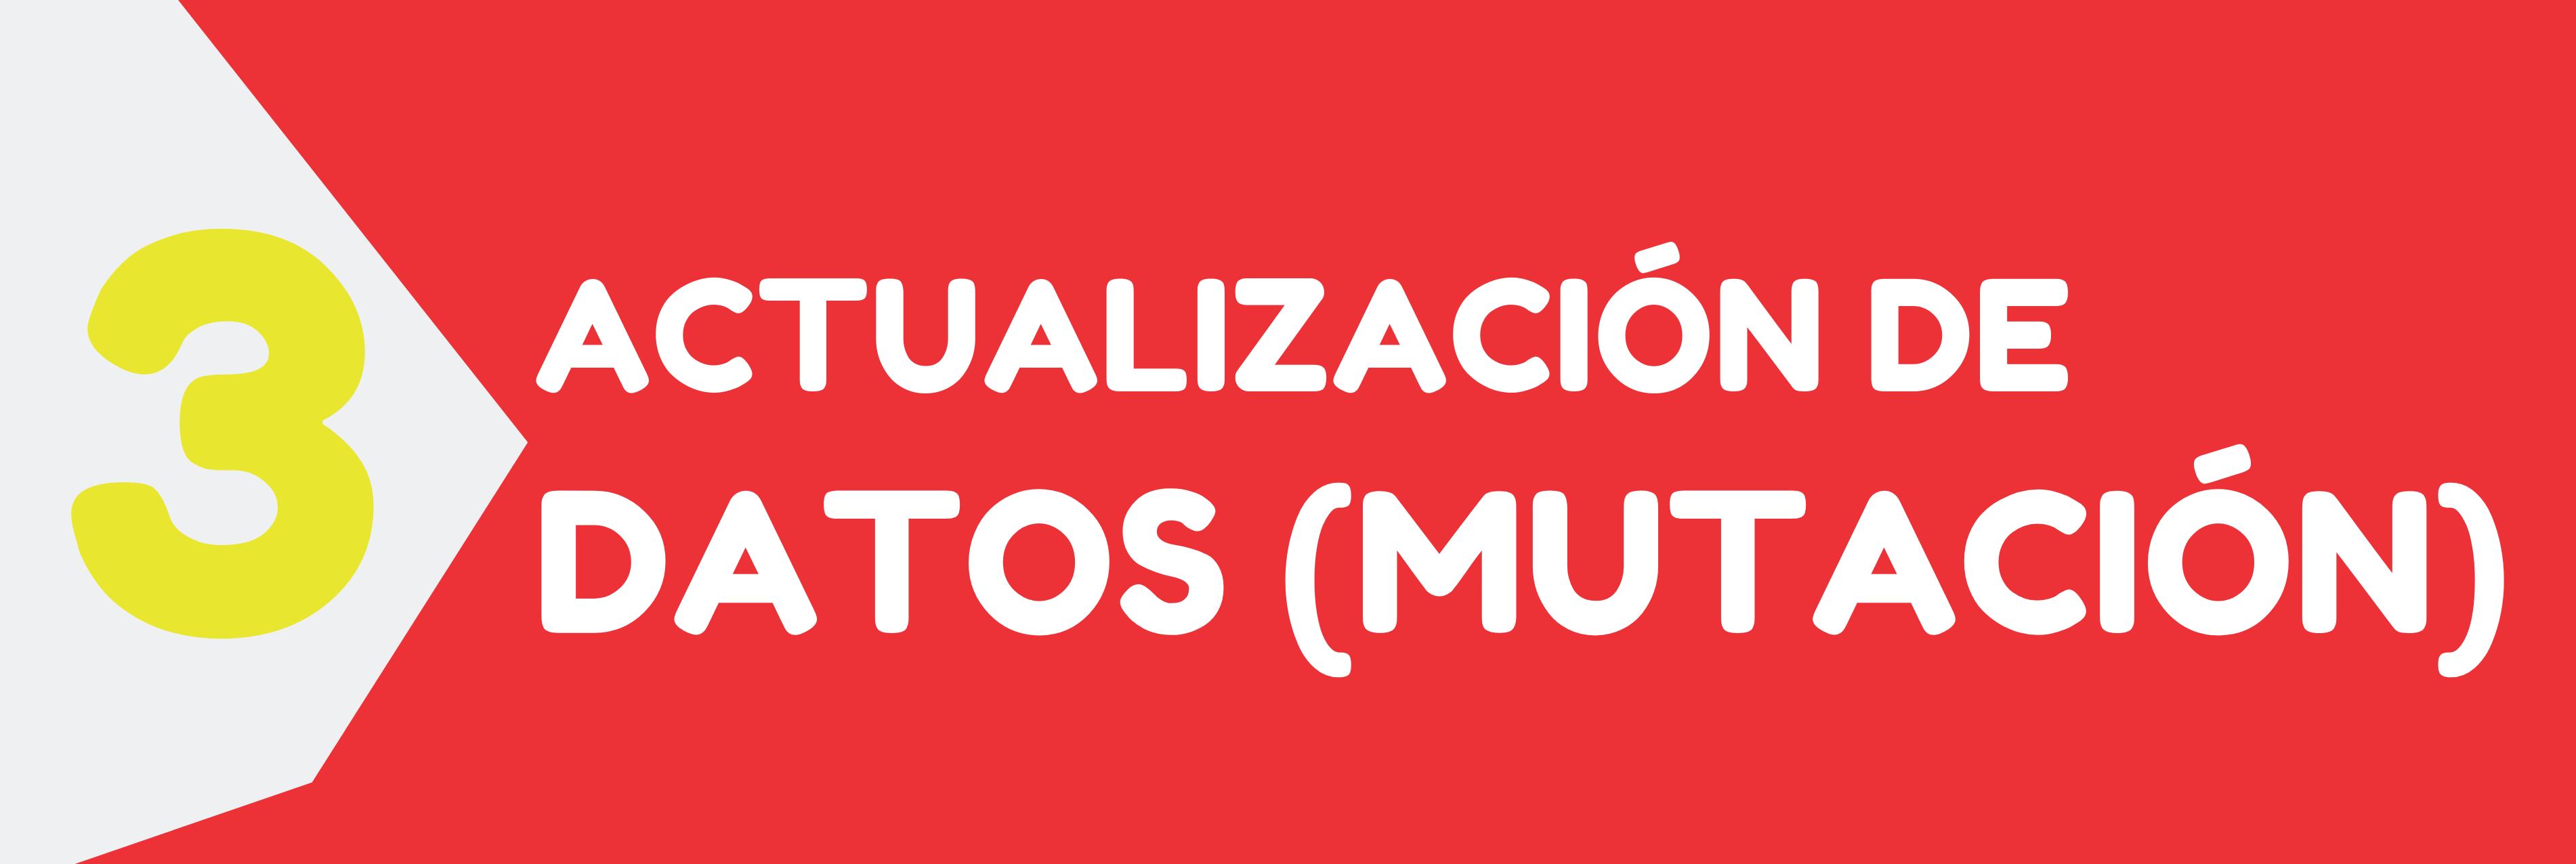 http://ccmagangue.org.co/media/imagenes/serviciosvirtuales/actualizaciondedatosmutacion